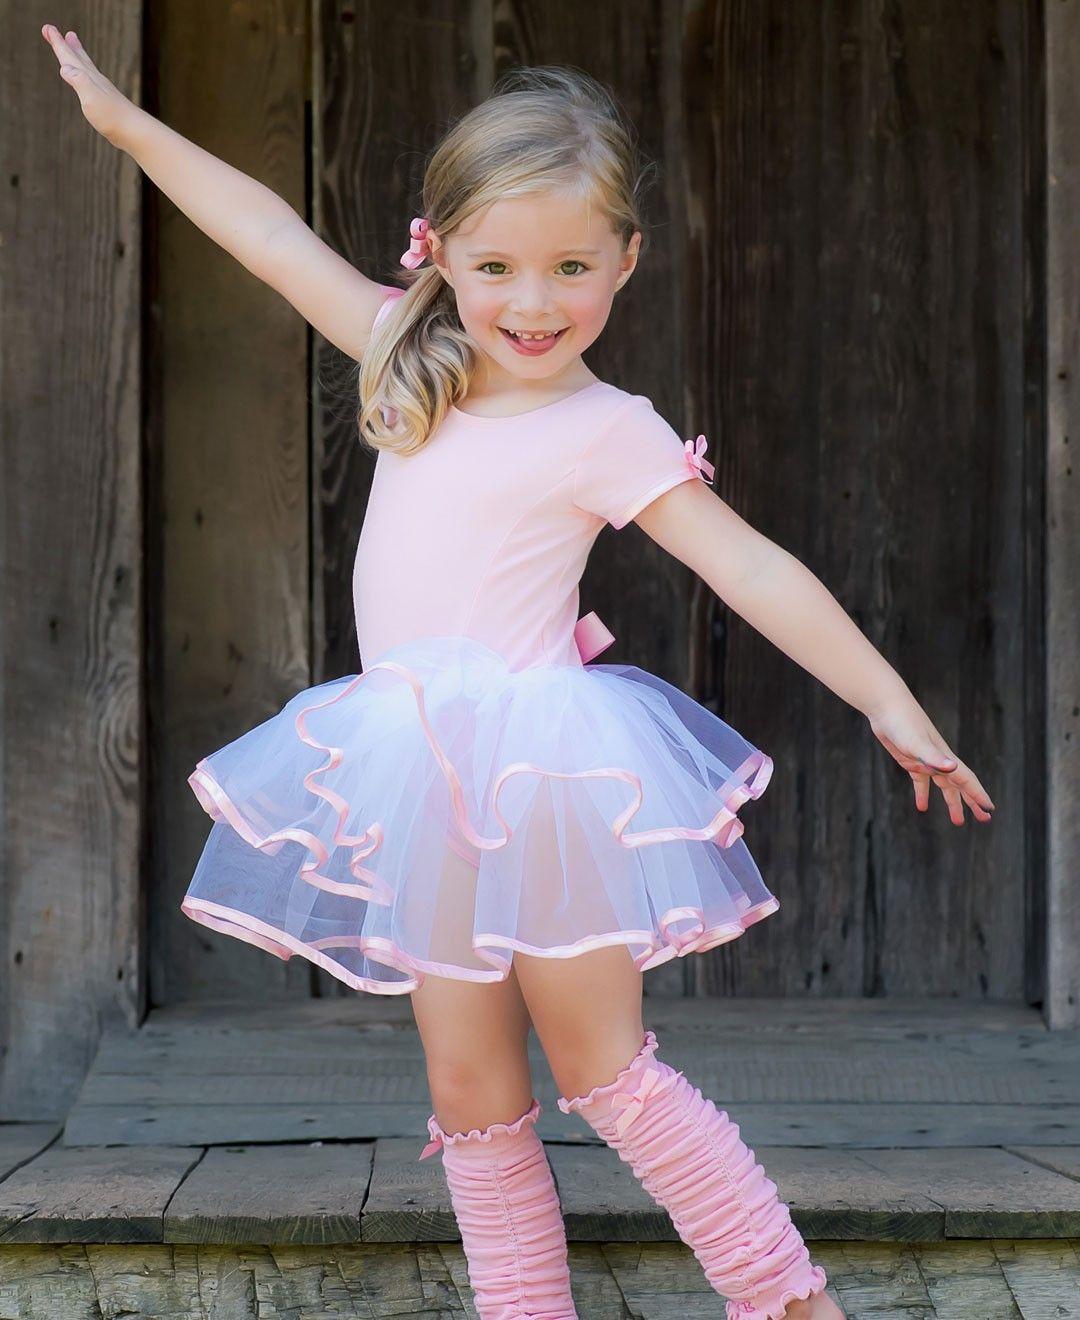 96887aa92 Short Sleeve Pink   White Tutu Leotard